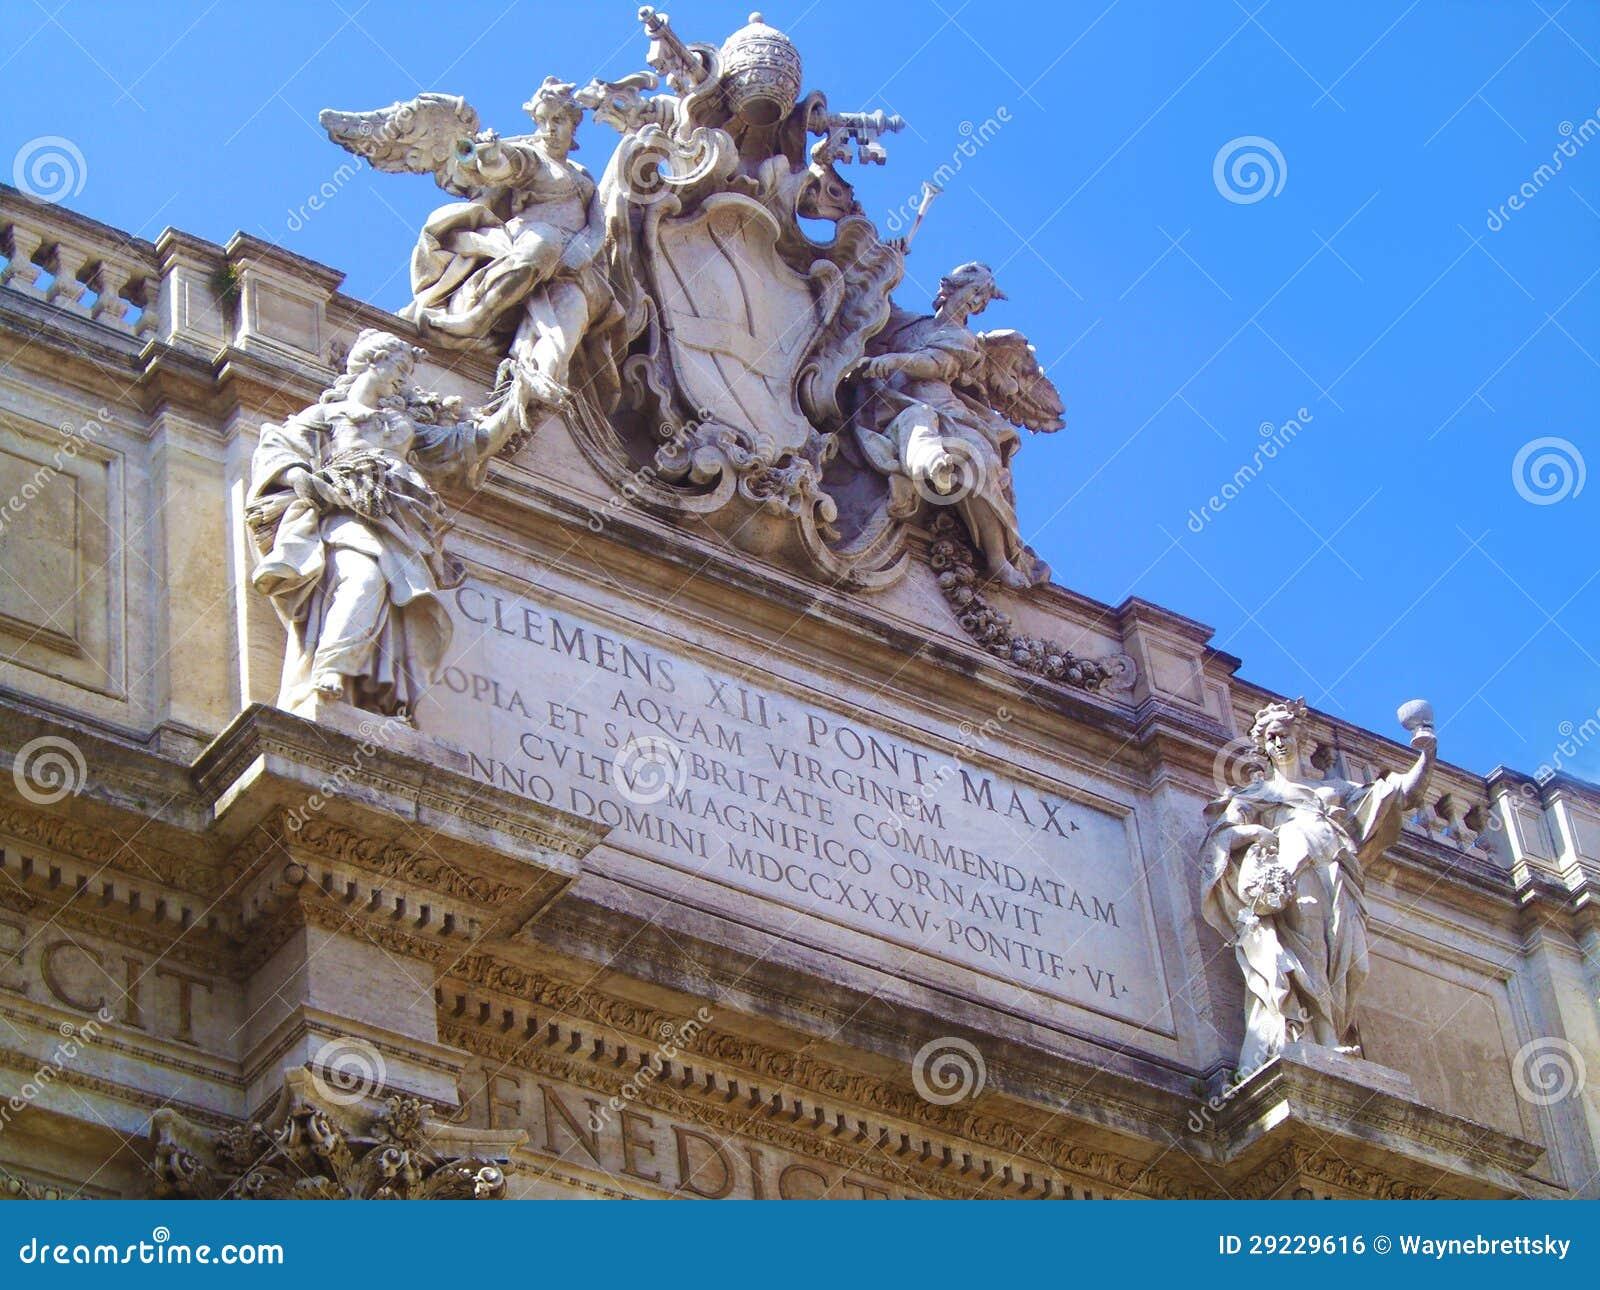 Download Trevi foto de stock. Imagem de arquitetura, classical - 29229616